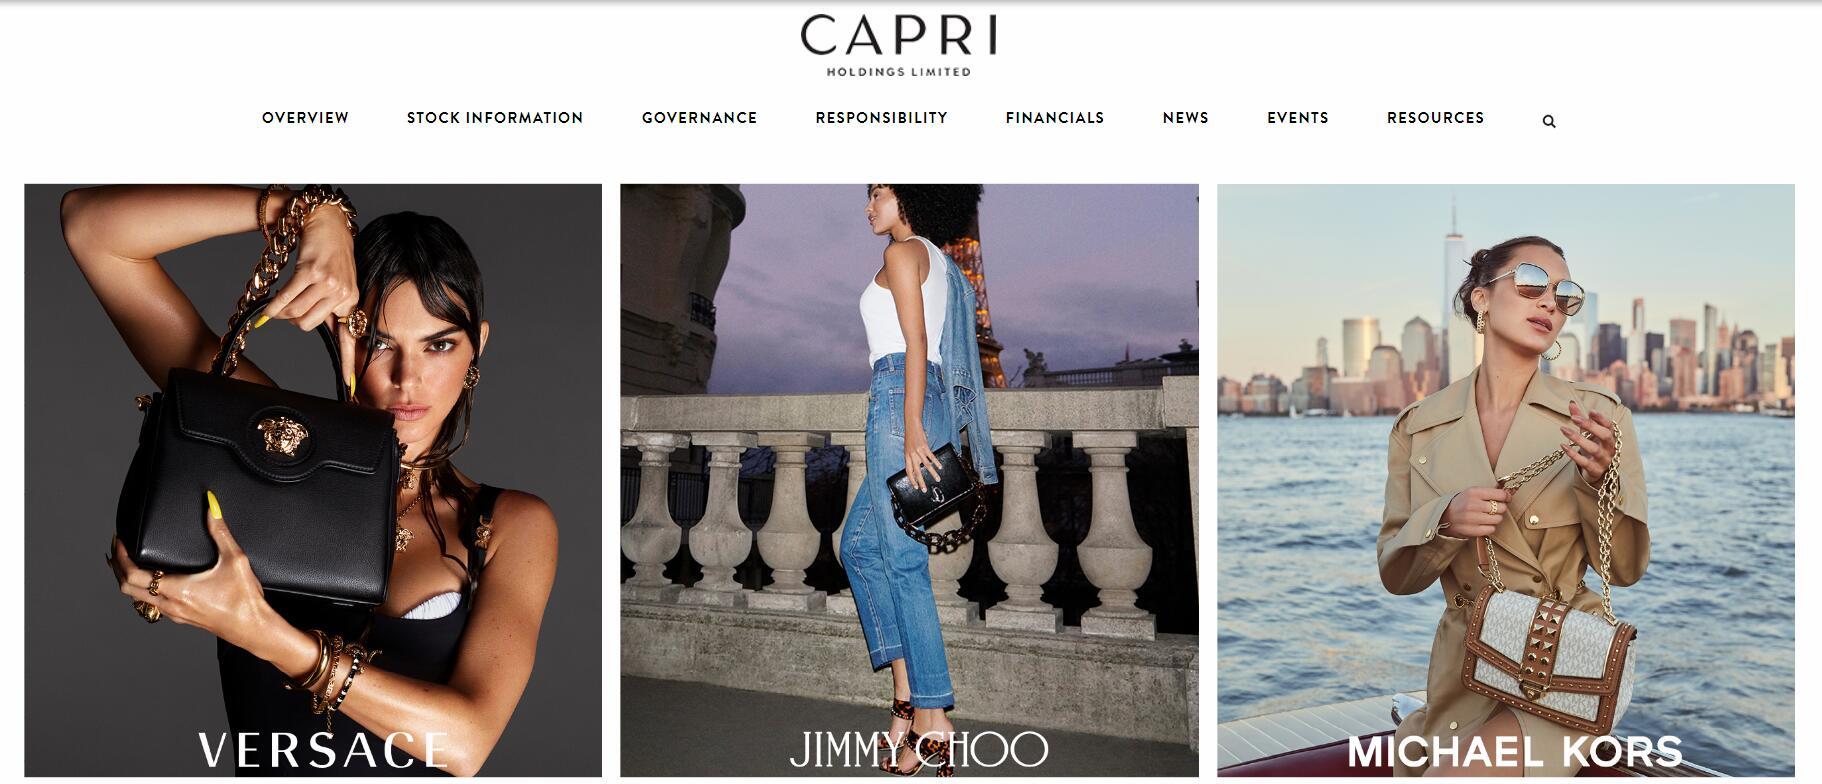 Capri 团体委派亚太地区区高管;Valentino 委派大中华区CEO